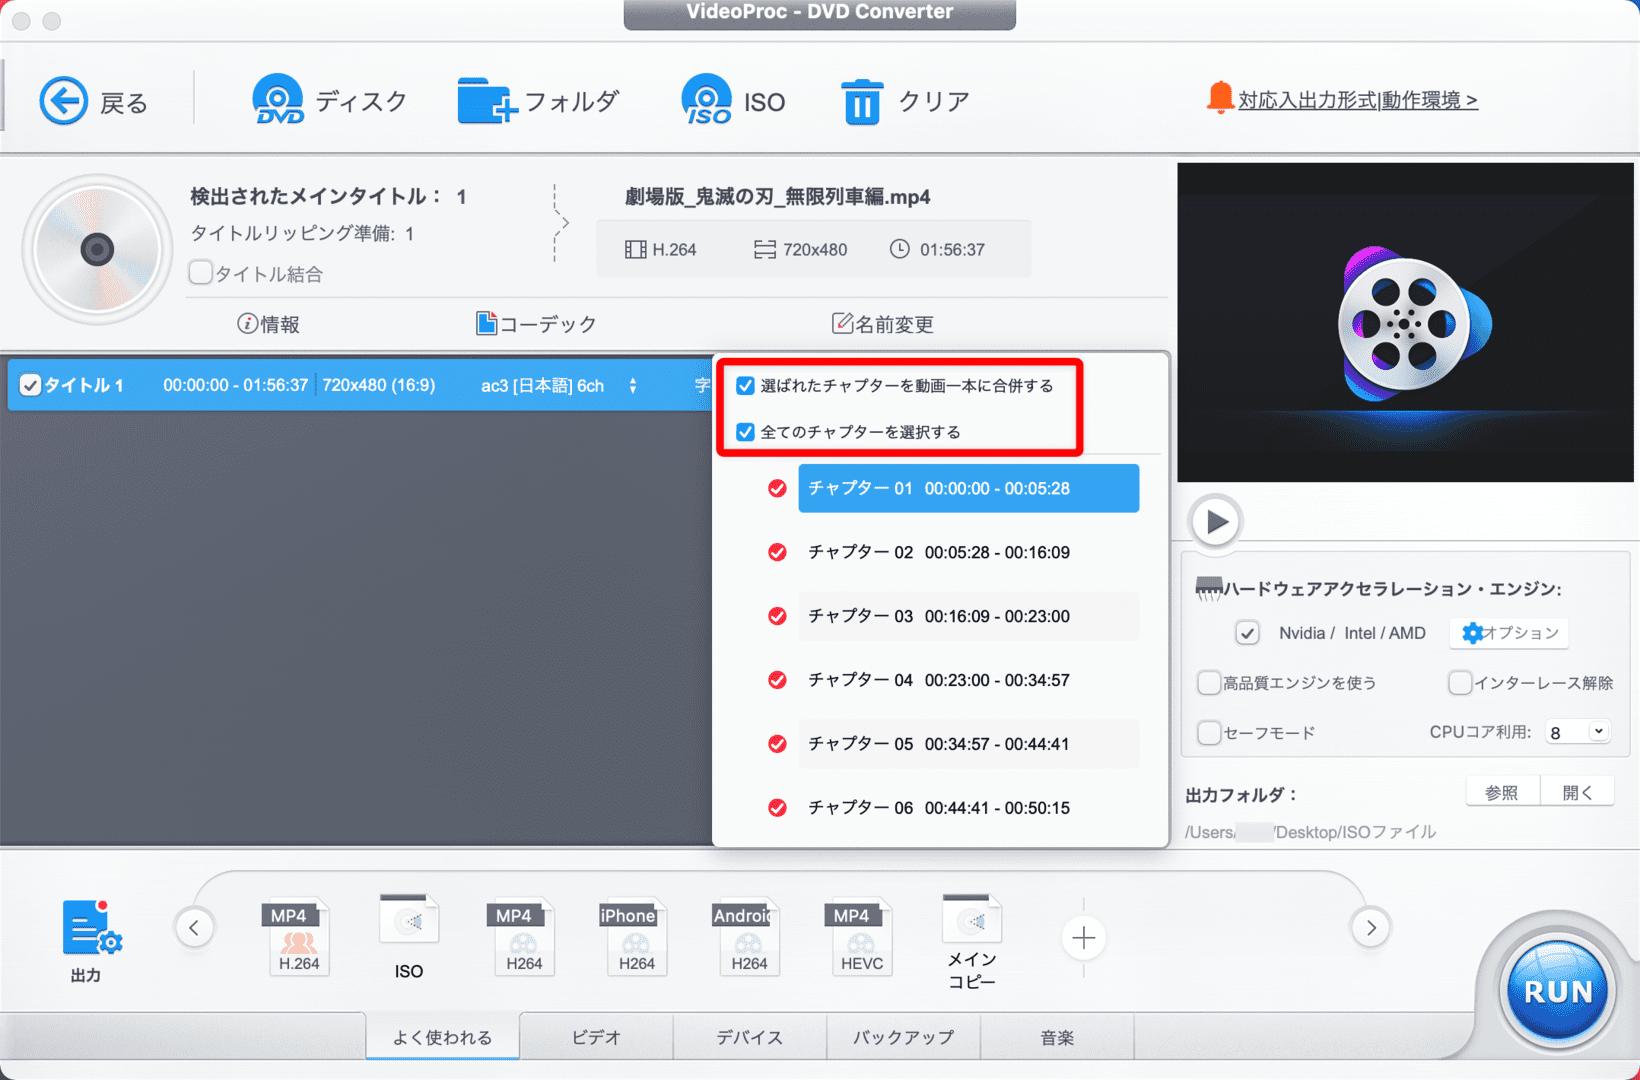 【DVDをiPhoneにコピーして観る】DVDリッピング~データ変換・スマホに取り込む方法|コピーガード解除、MP4・ISOのパソコン保存もVideoProcなら簡単!|DVDデータをmp4形式に変換する:処理したい動画データを選択する:なお基本的に「選ばれたチャプターを動画一本に結合する」「全てのチャプターを選択する」の2つにはチェックが入っています。